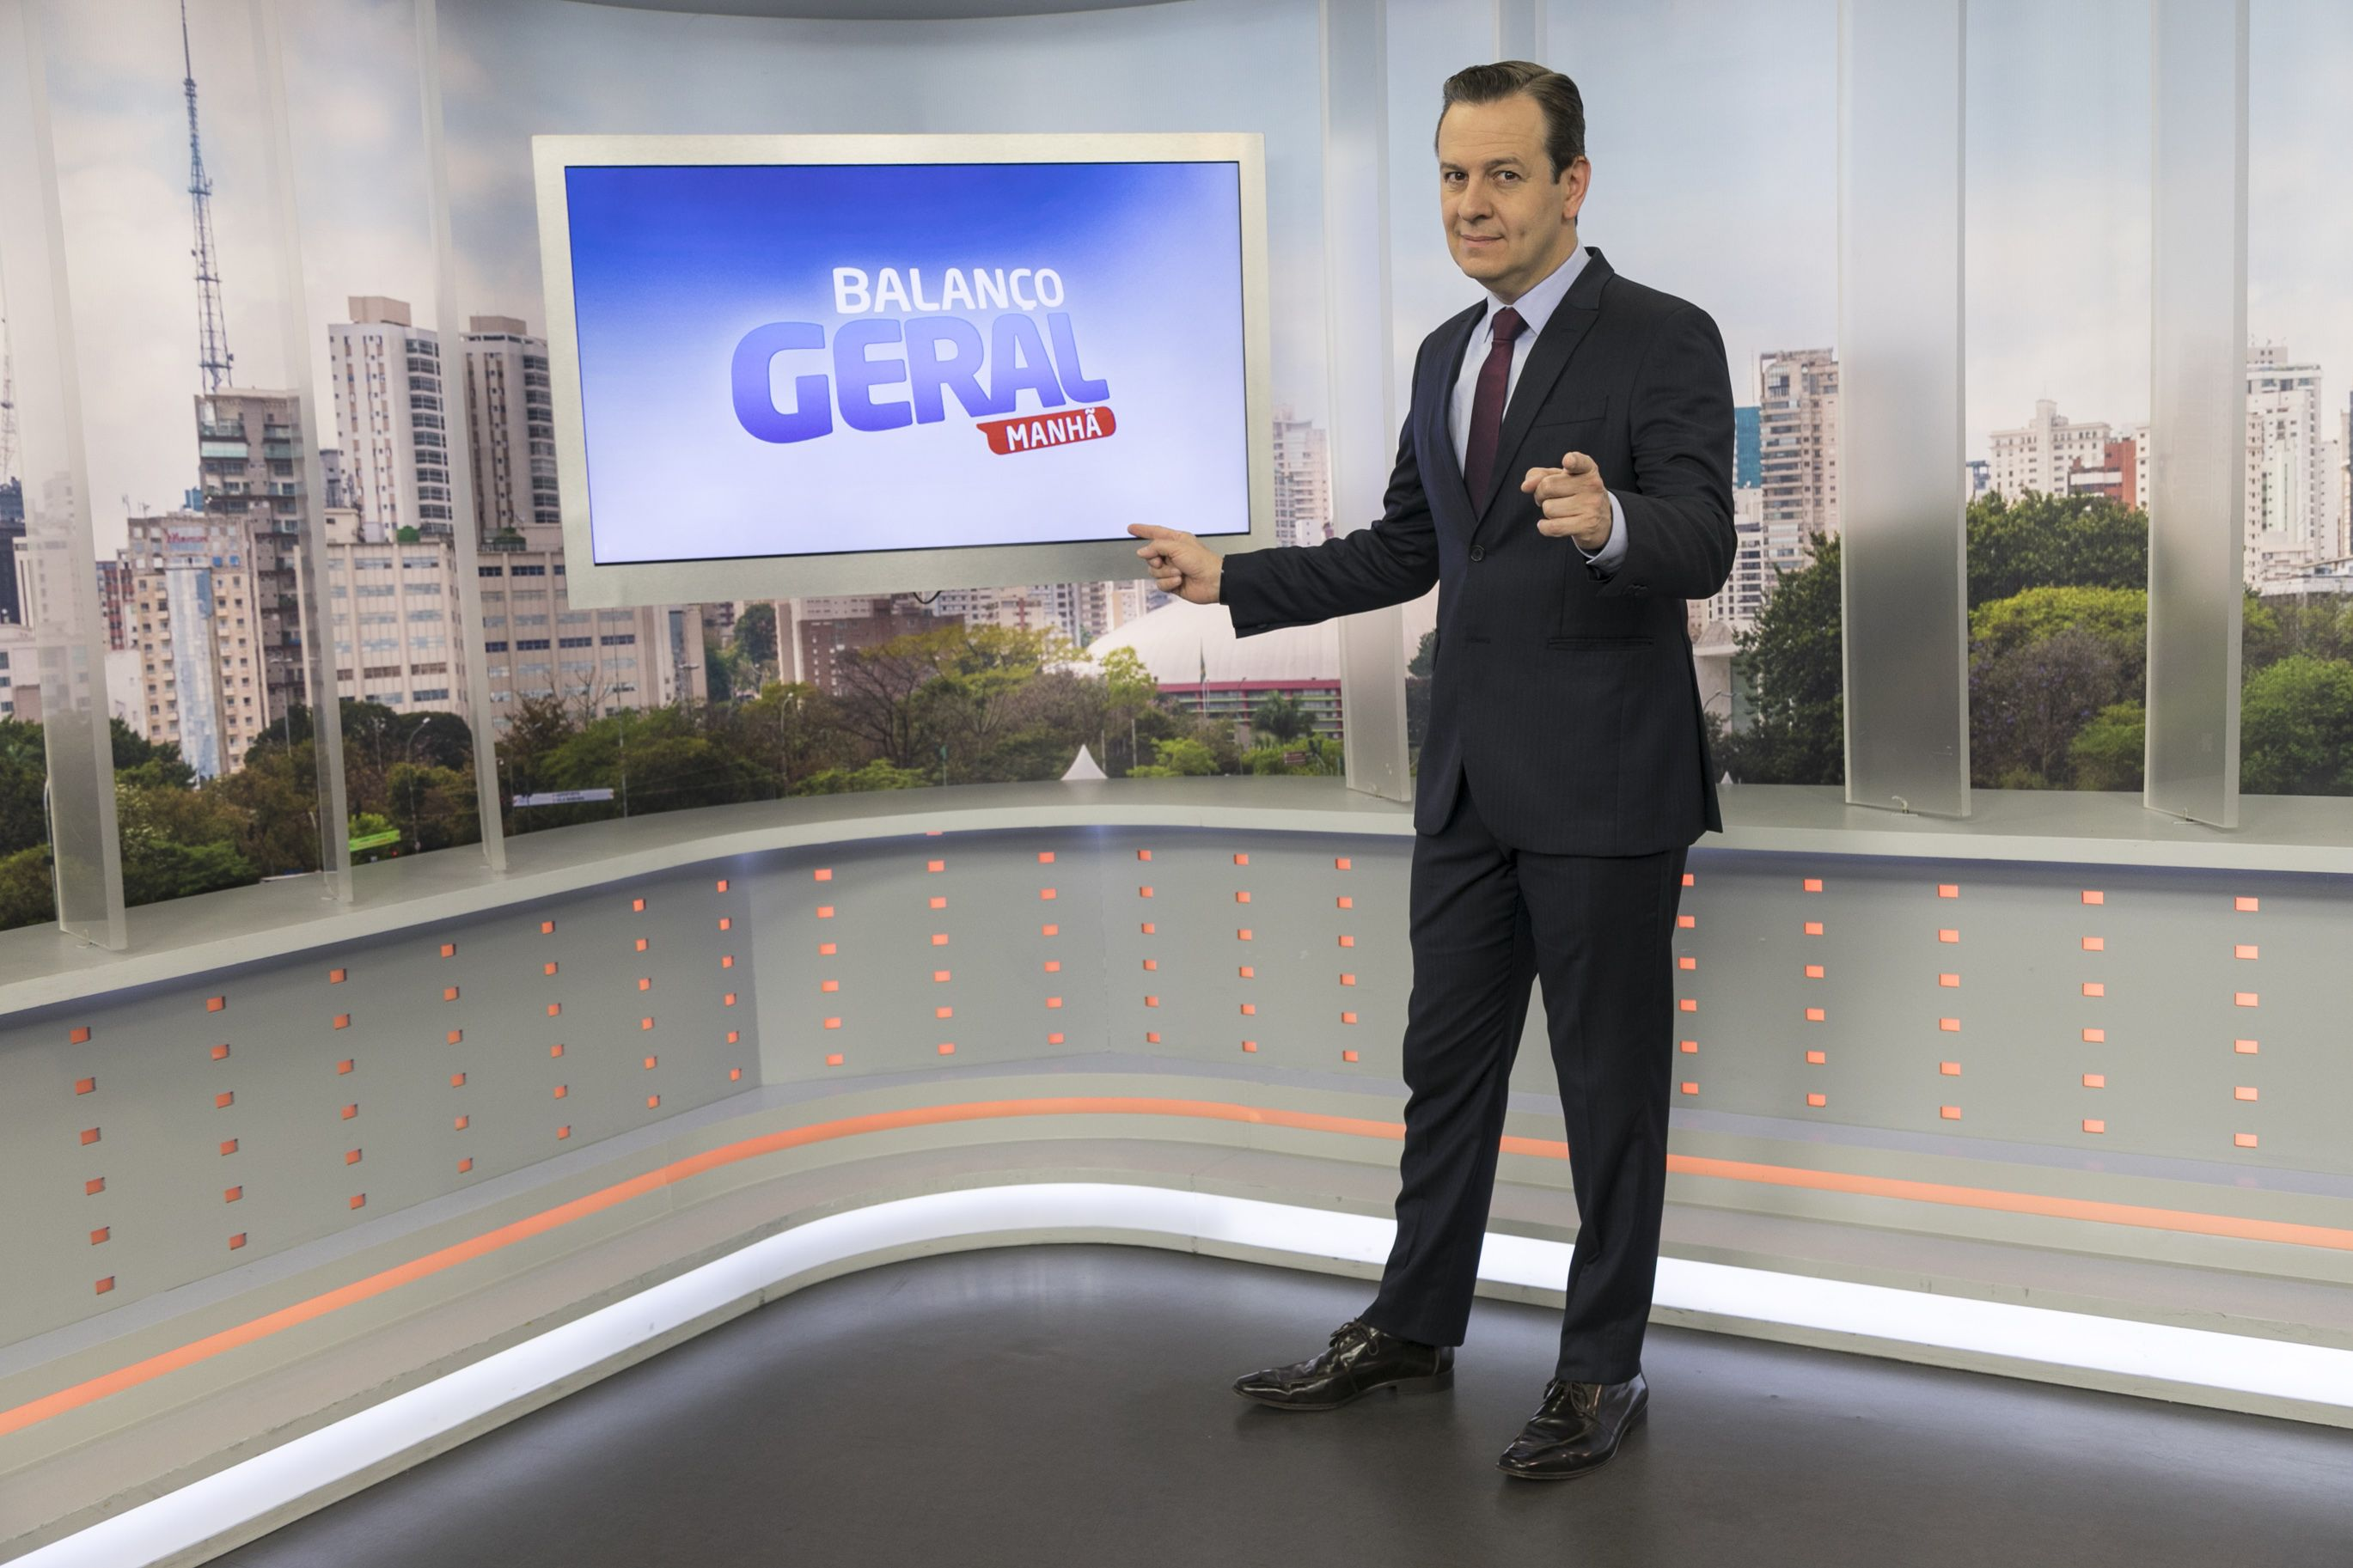 Foto: Antonio Chahestian/Divulgação Record TV